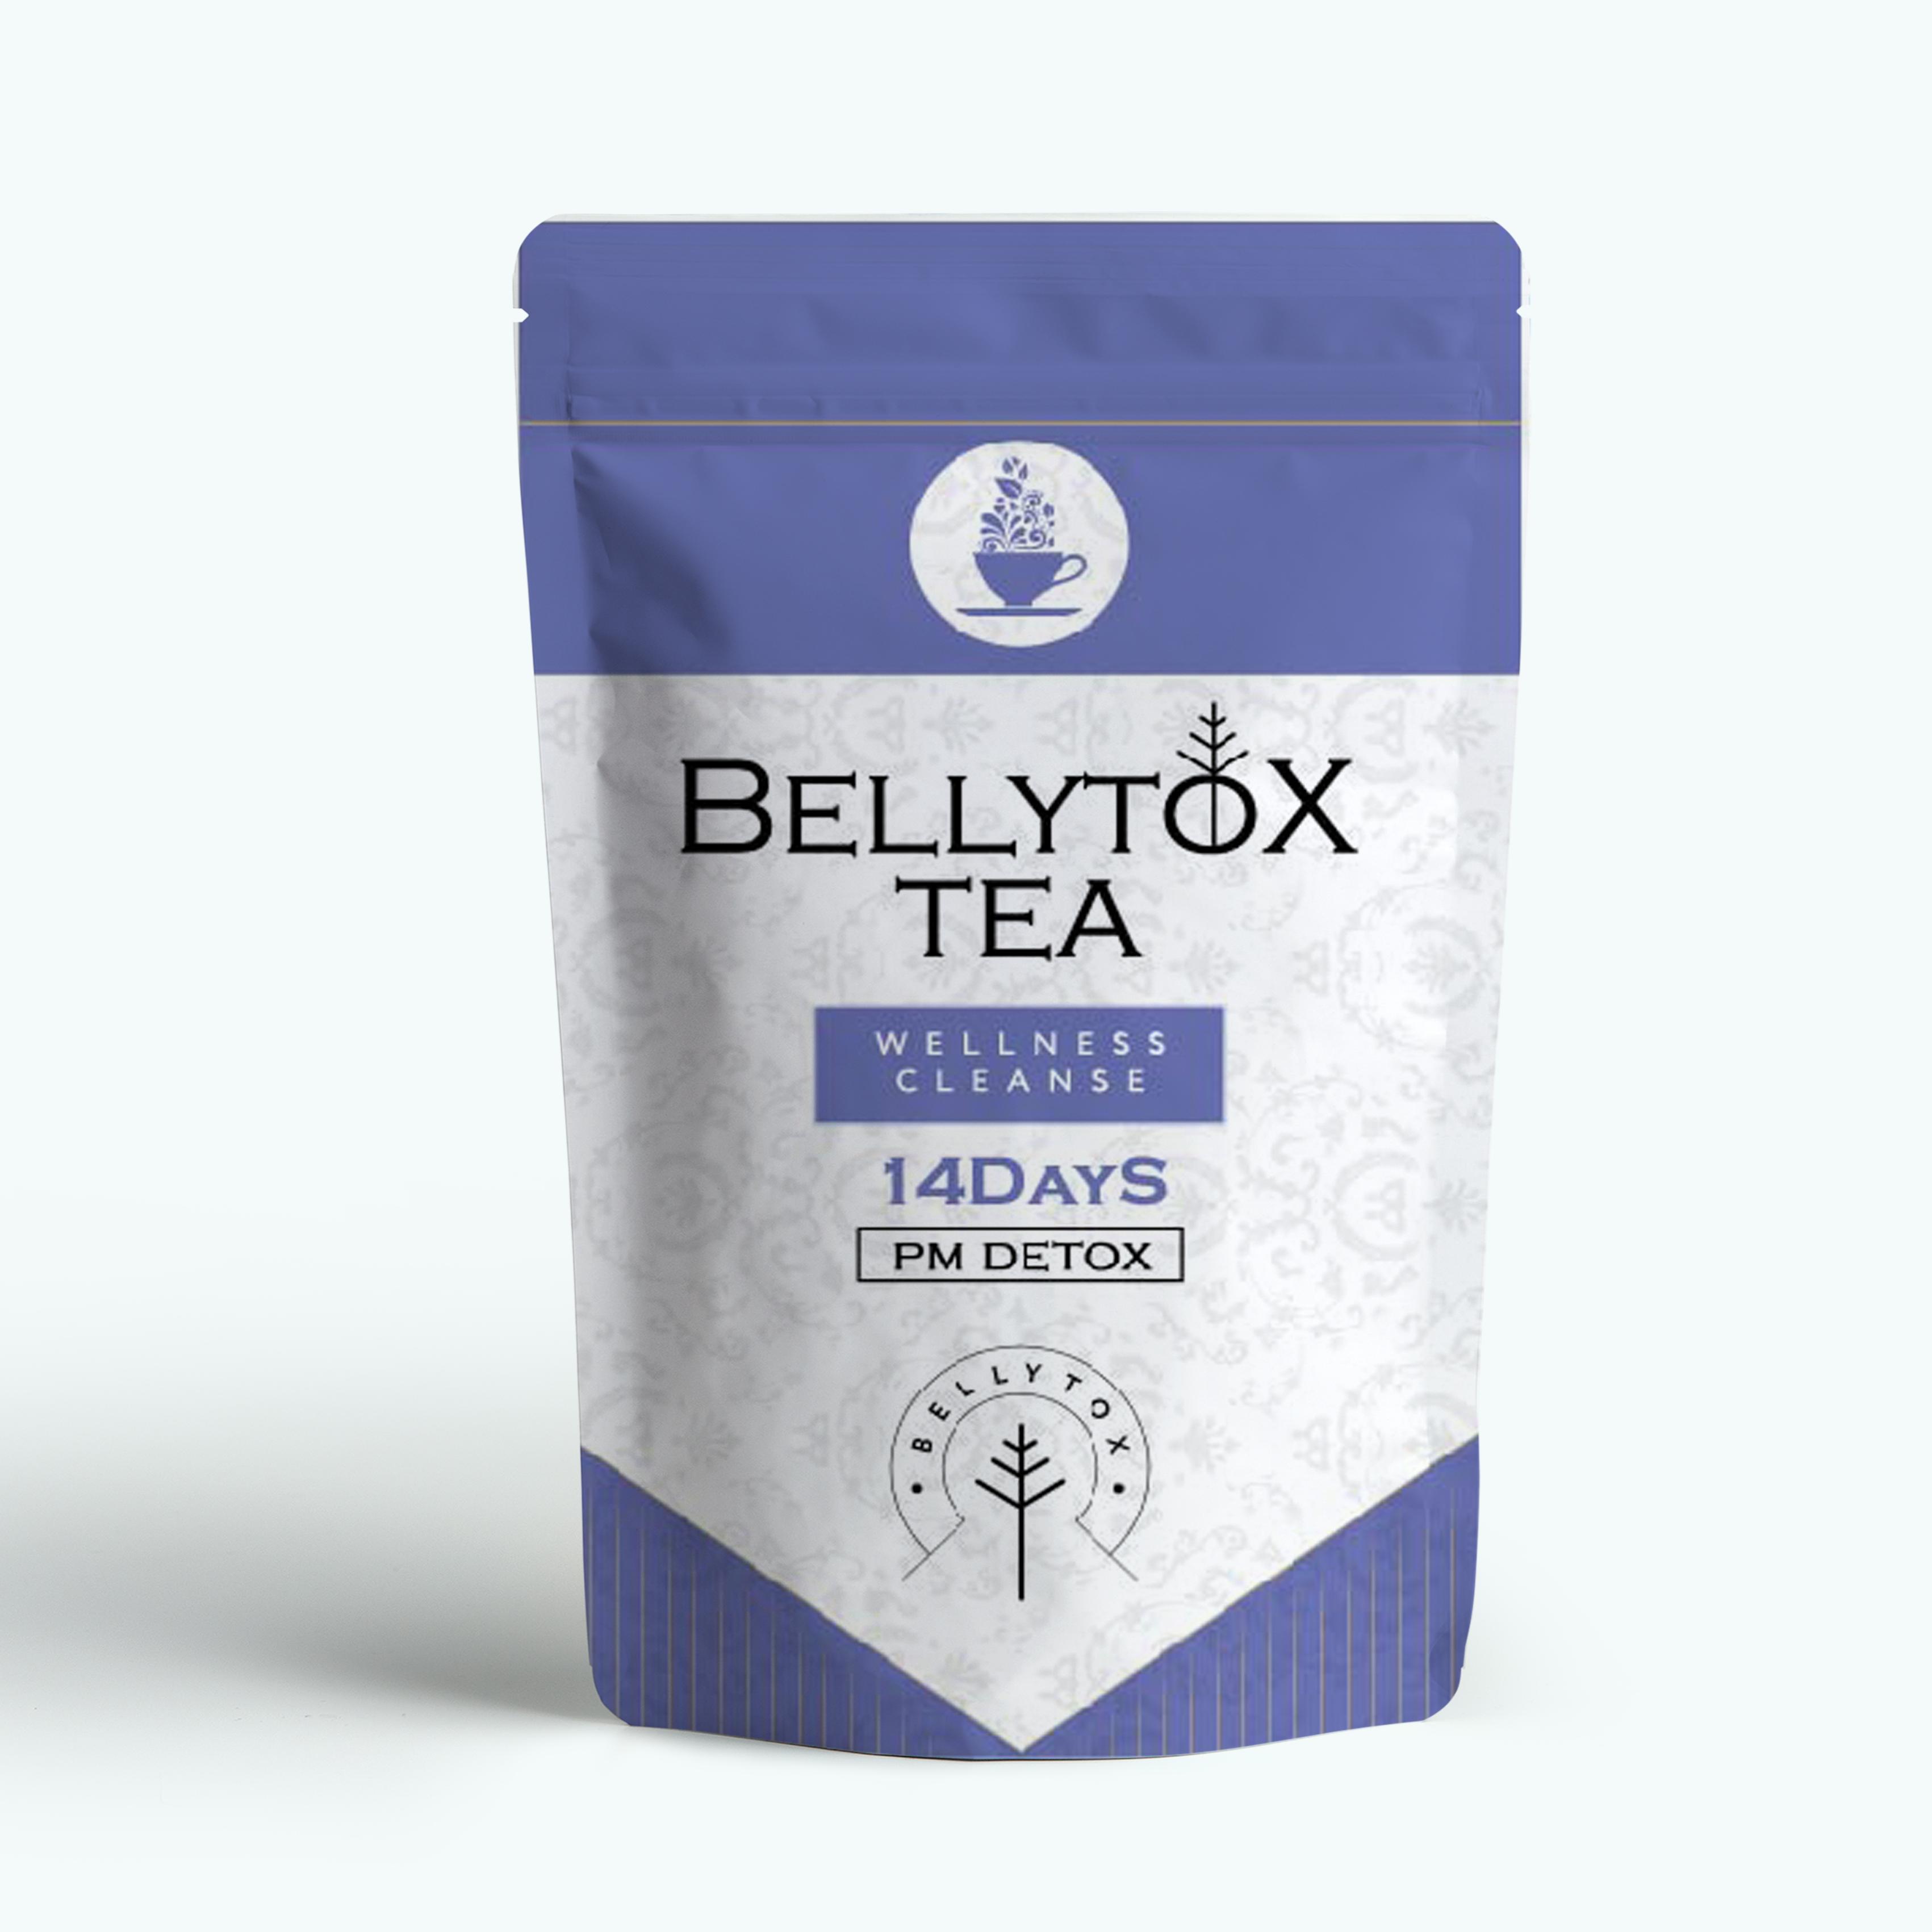 Detox Tea Herbal Tea For Immune Support (USDA Certified Organic/Fair Trade/Caffeine-Free), Blueberry Tea, 28 Count - 4uTea   4uTea.com